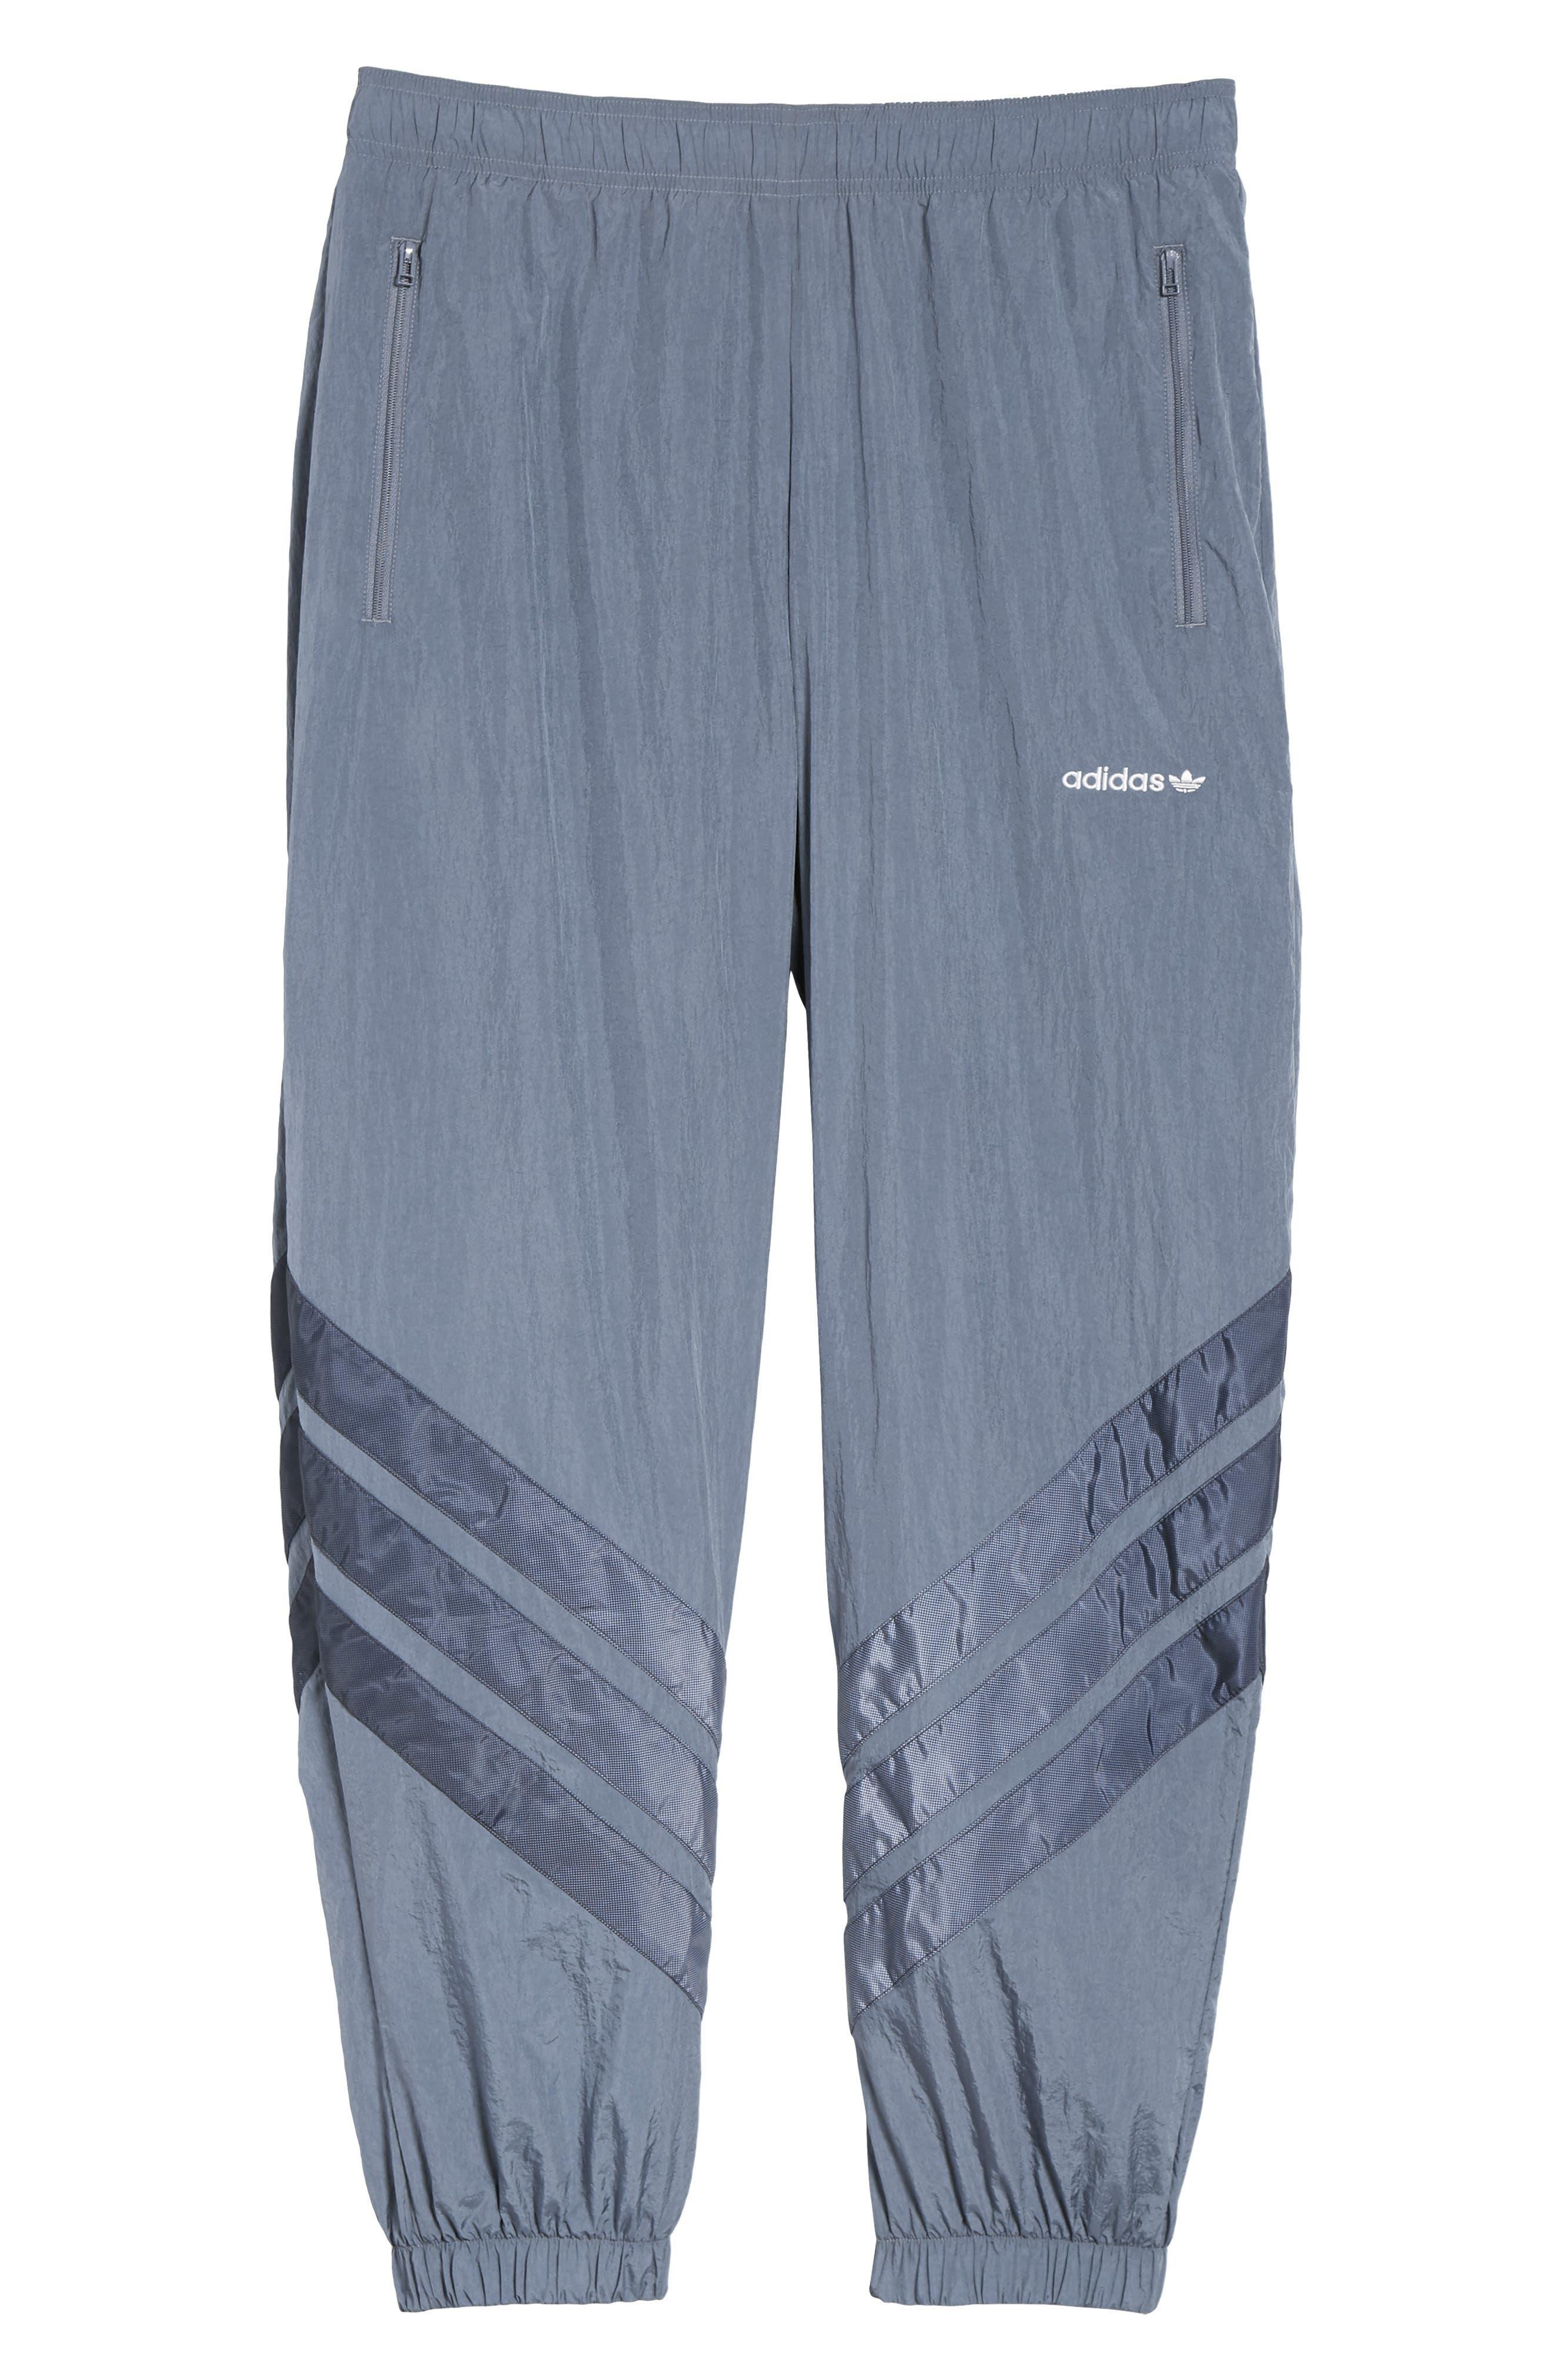 Originals V-Stripe Windpants,                             Alternate thumbnail 6, color,                             422